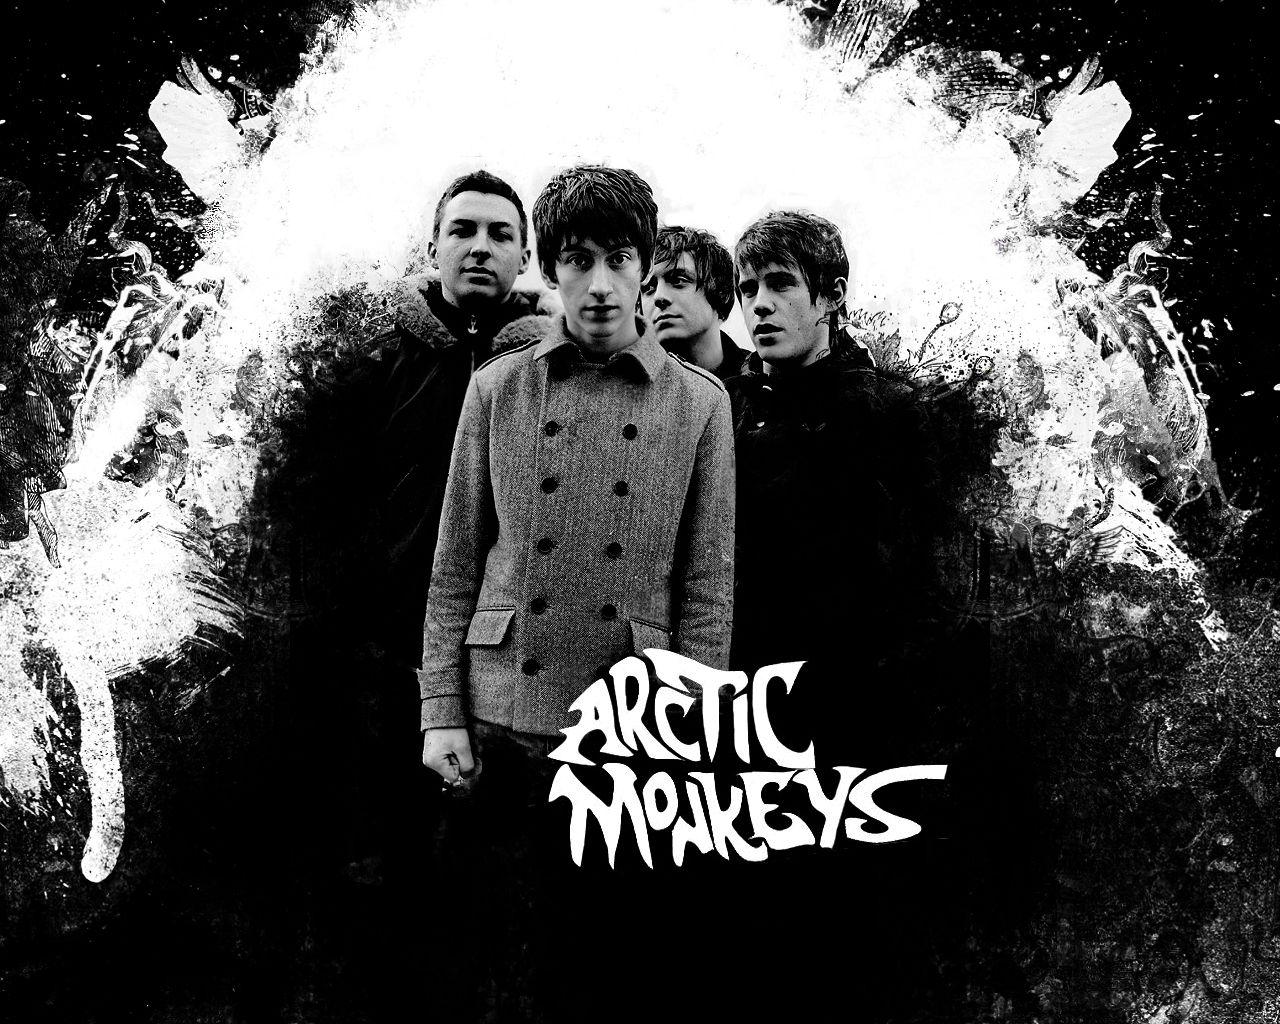 http://www.theriffrepeater.com/wp-content/uploads/2013/08/1Arctic-Monkeys-3-arctic-monkeys-10718195-1280-1024.jpg